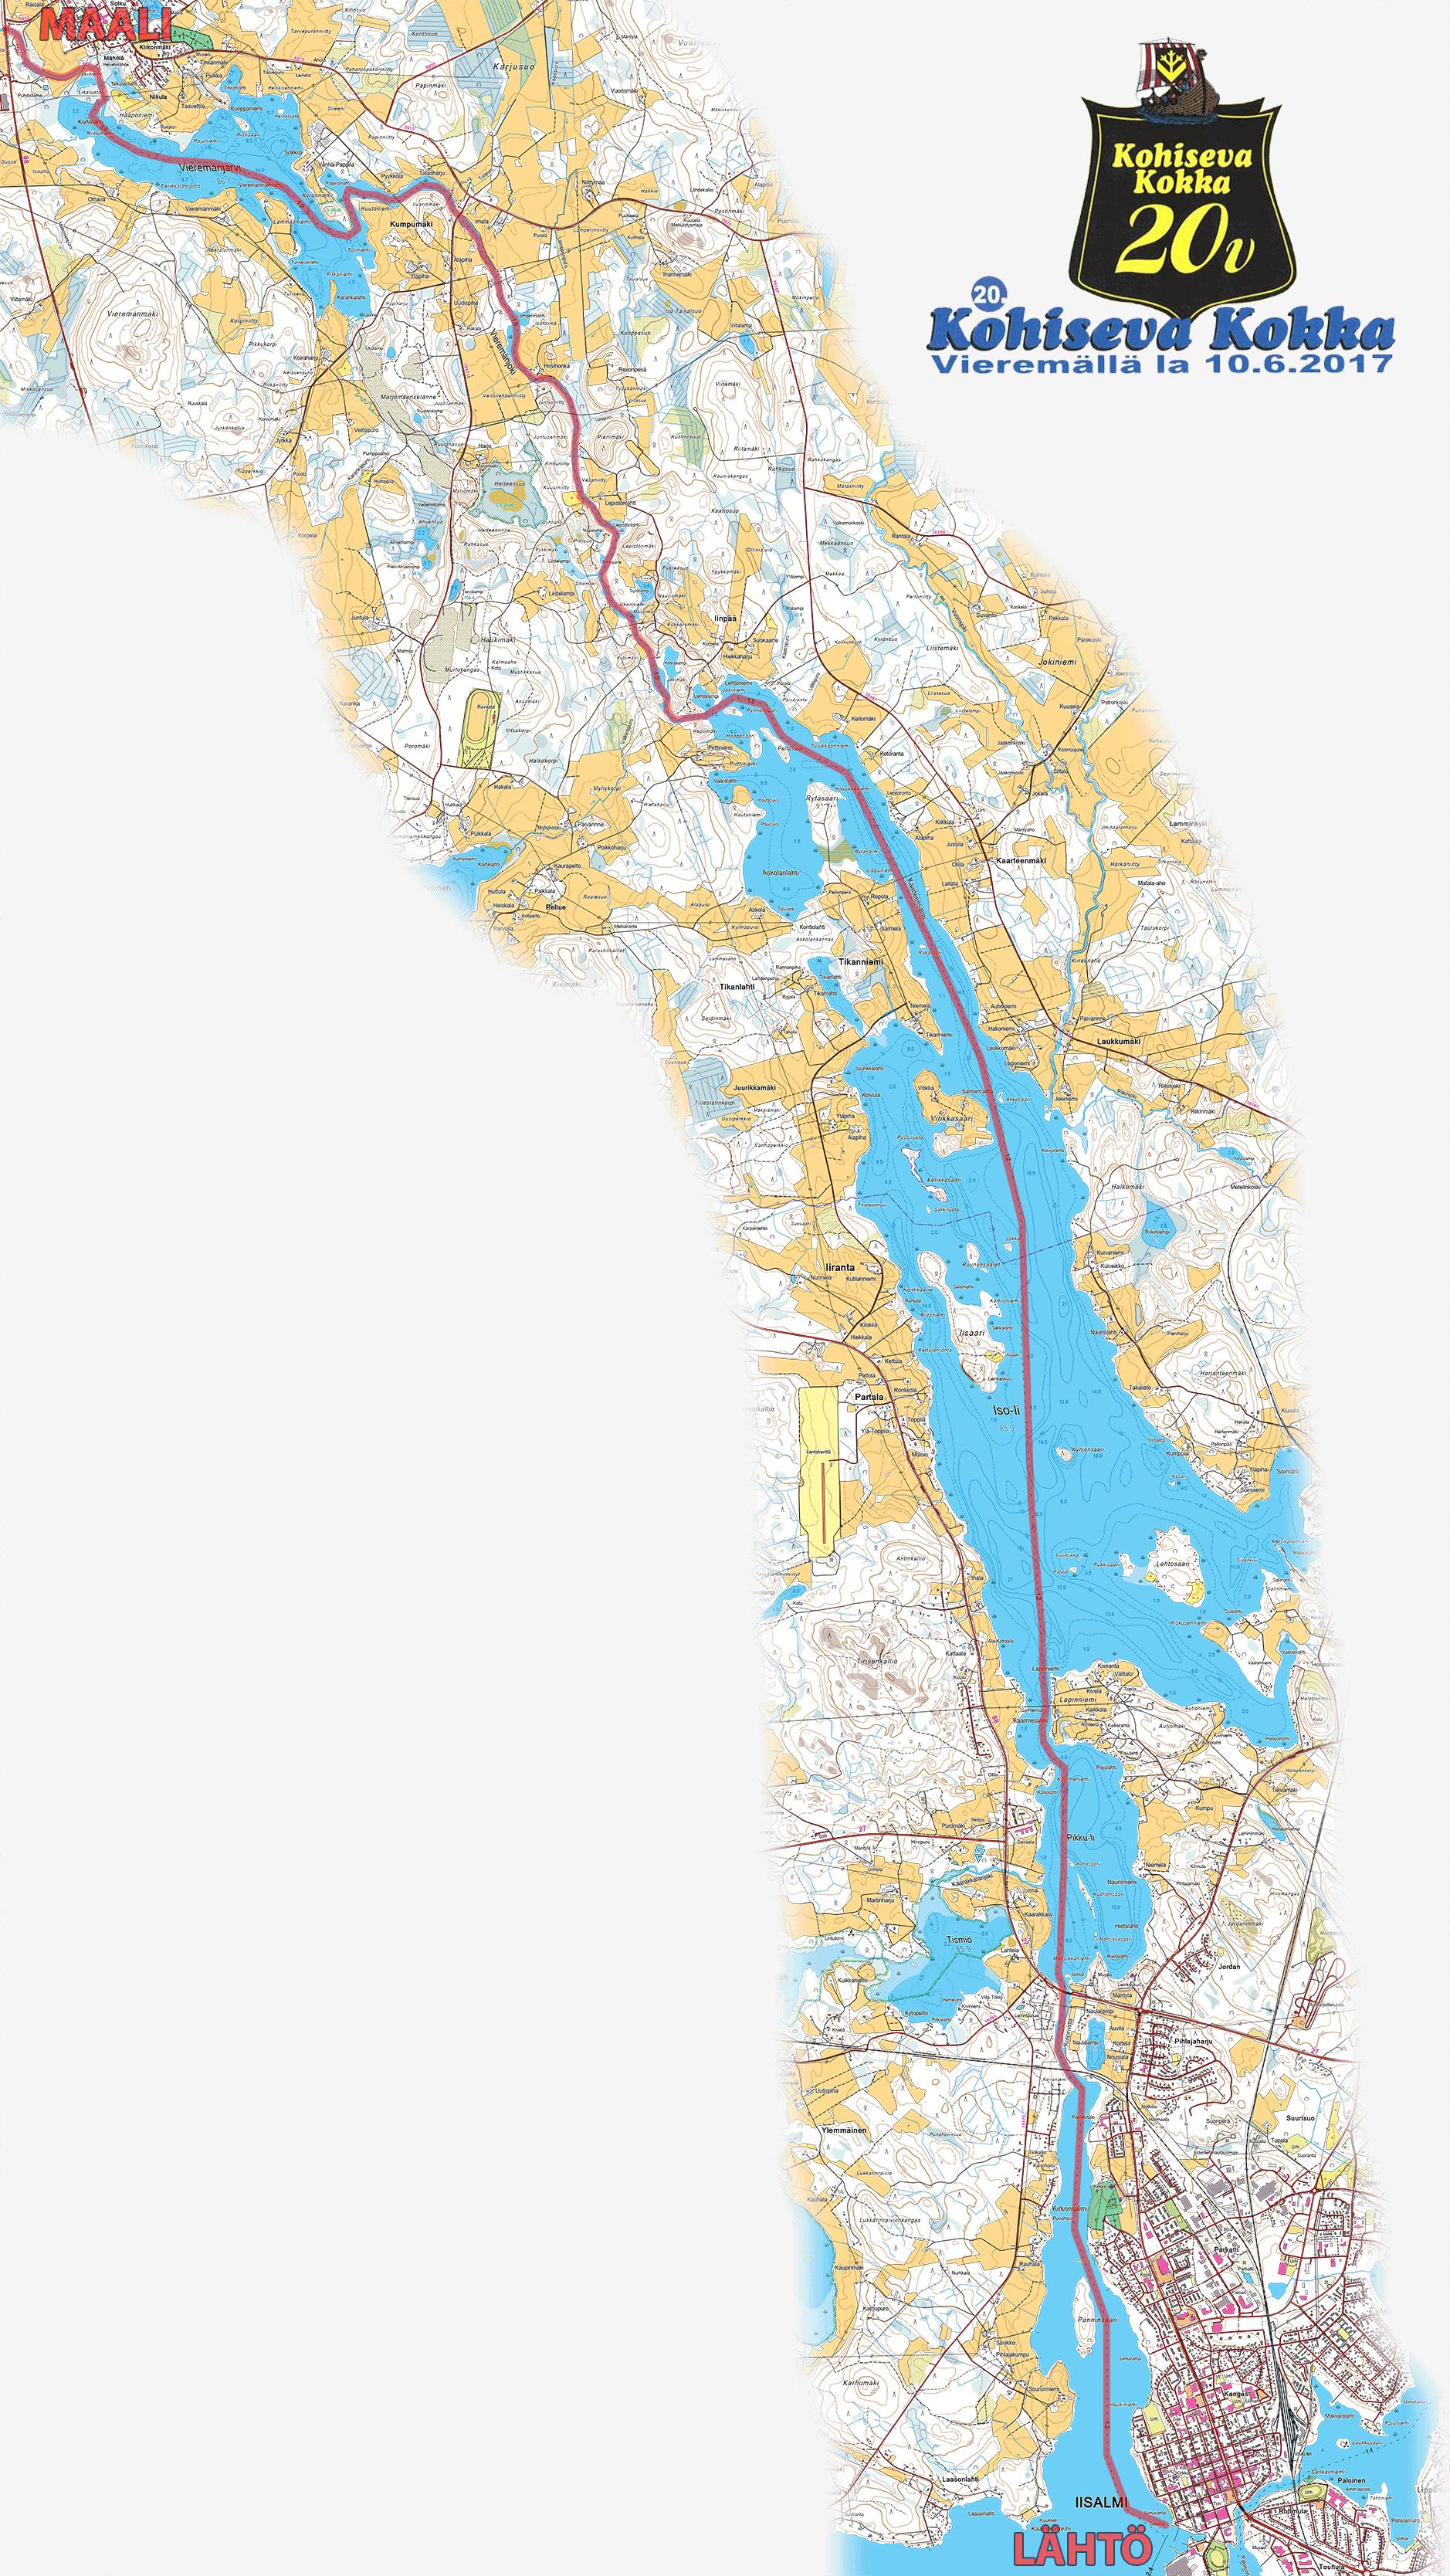 Kohiseva Kokka 2017 kirkkovenesoutu June 10th 2017 Orienteering